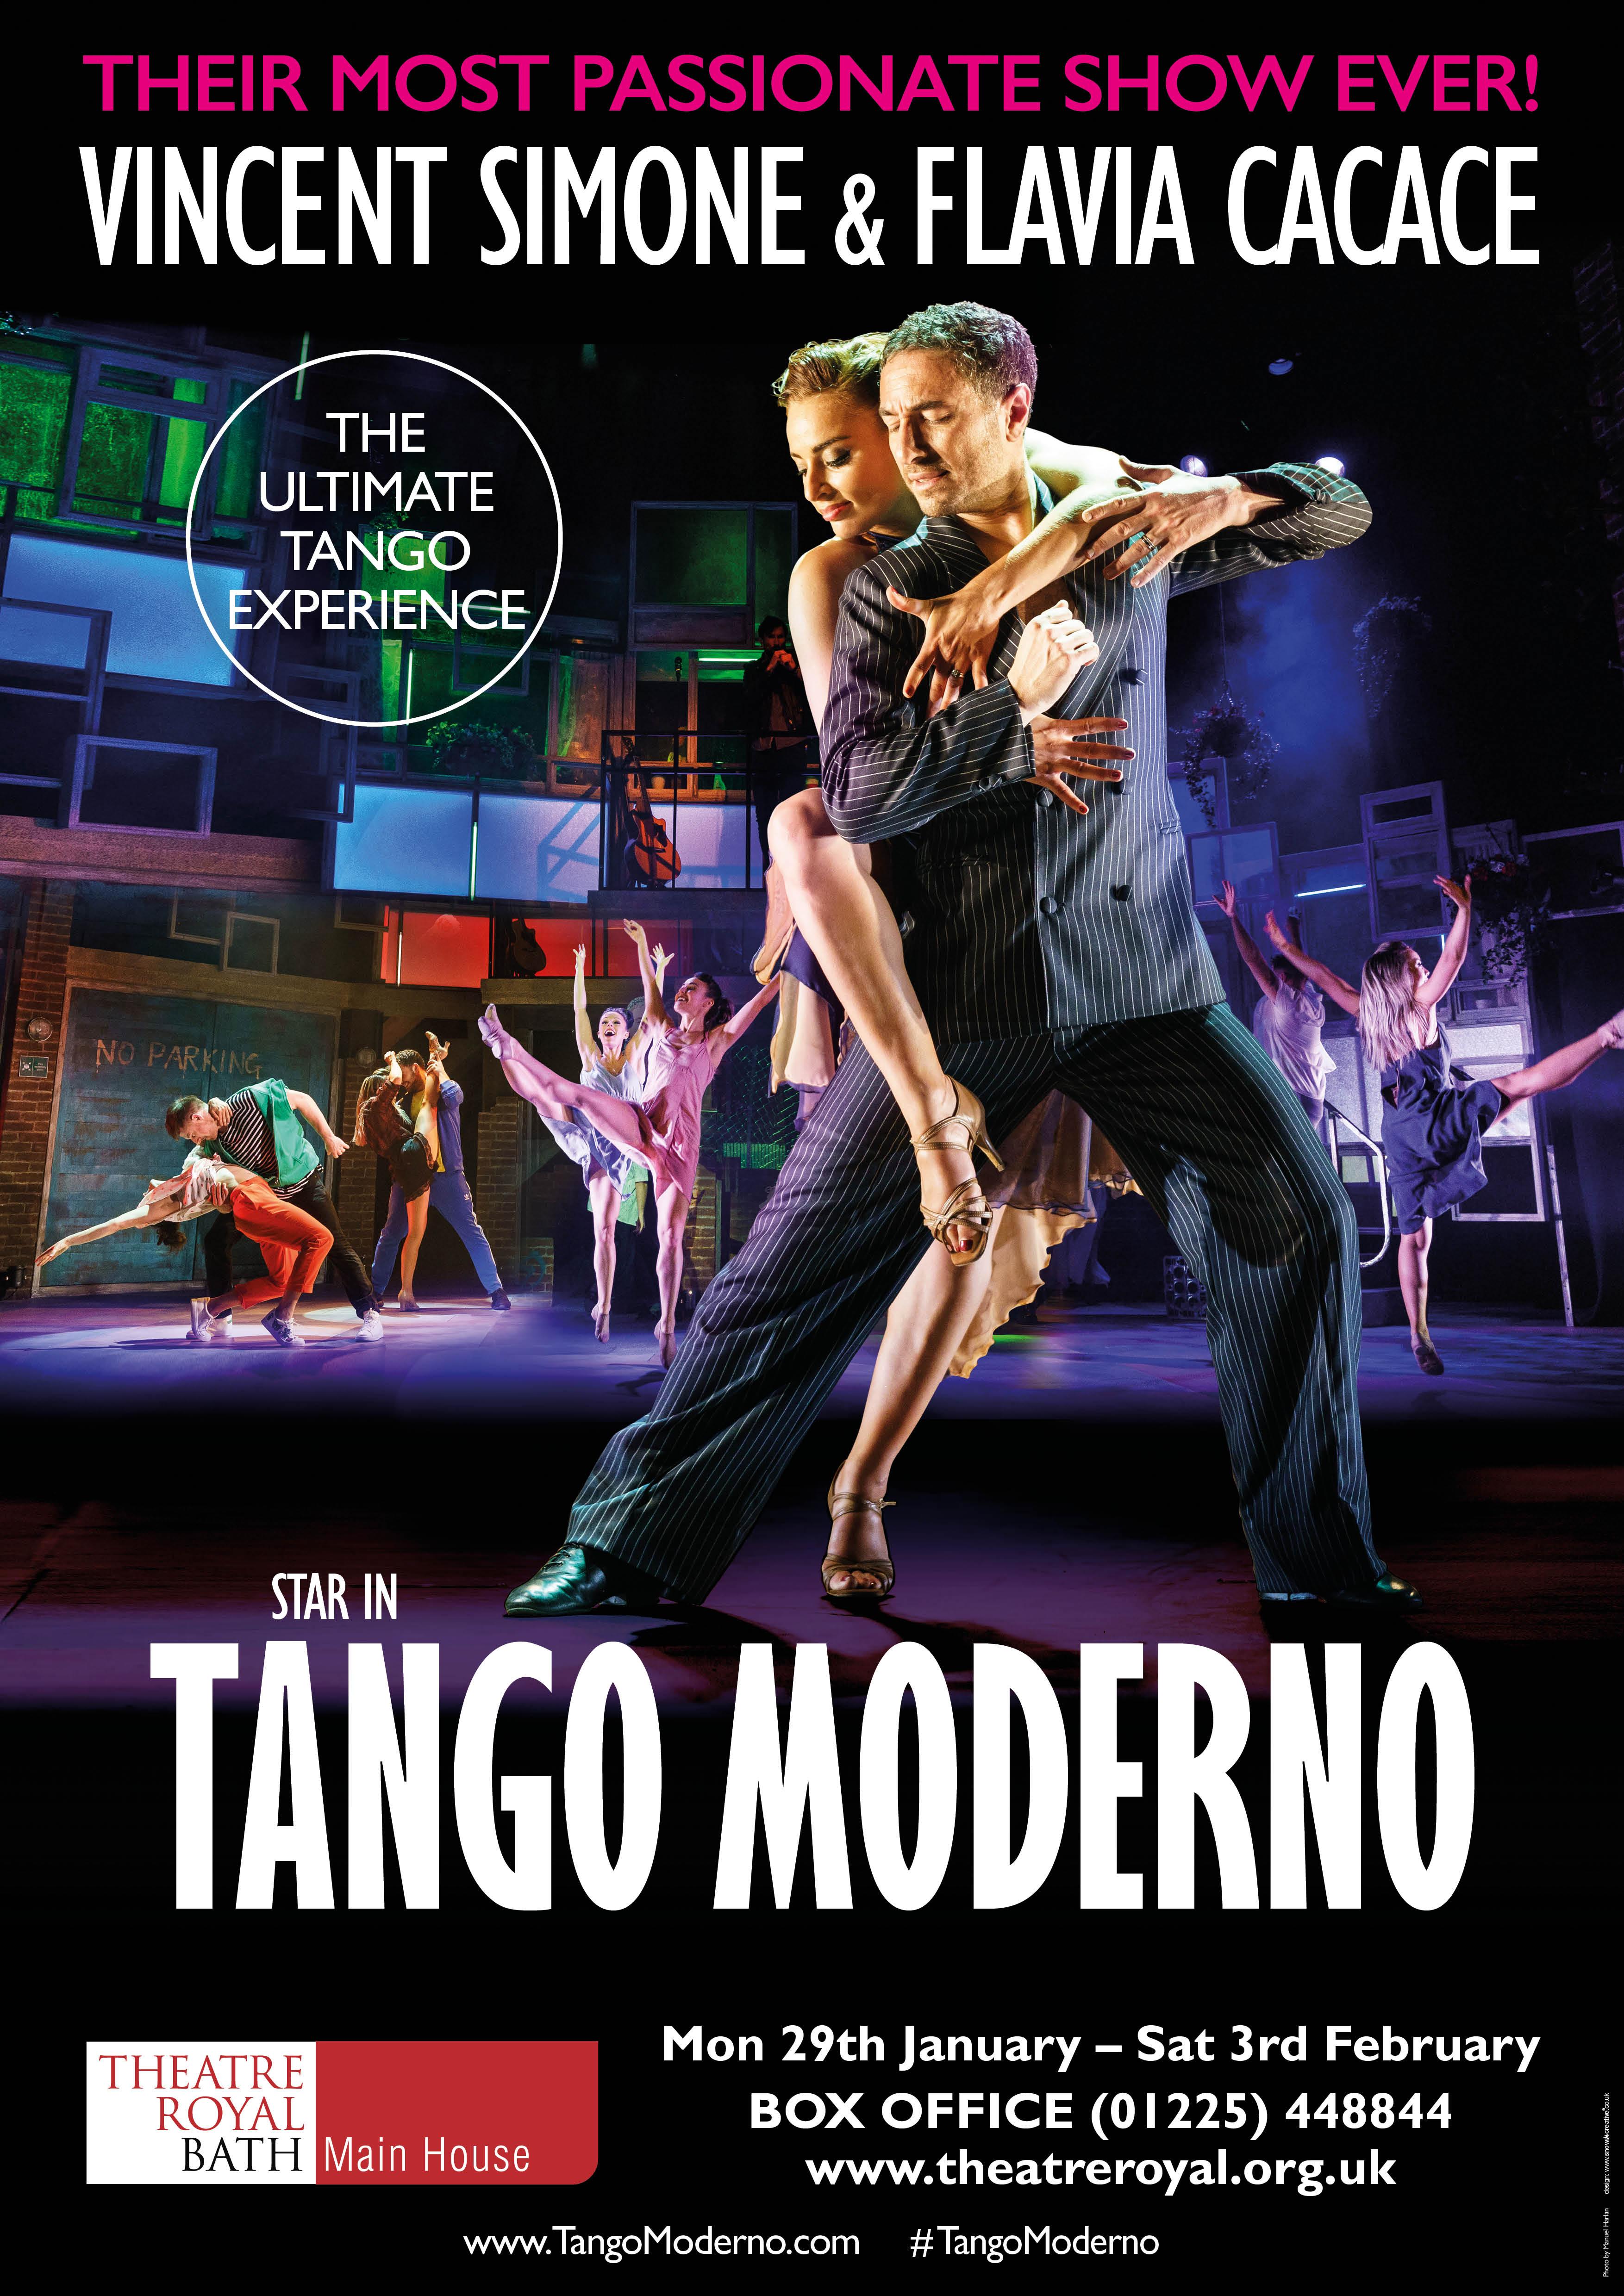 Tango Moderno Poster Show Image